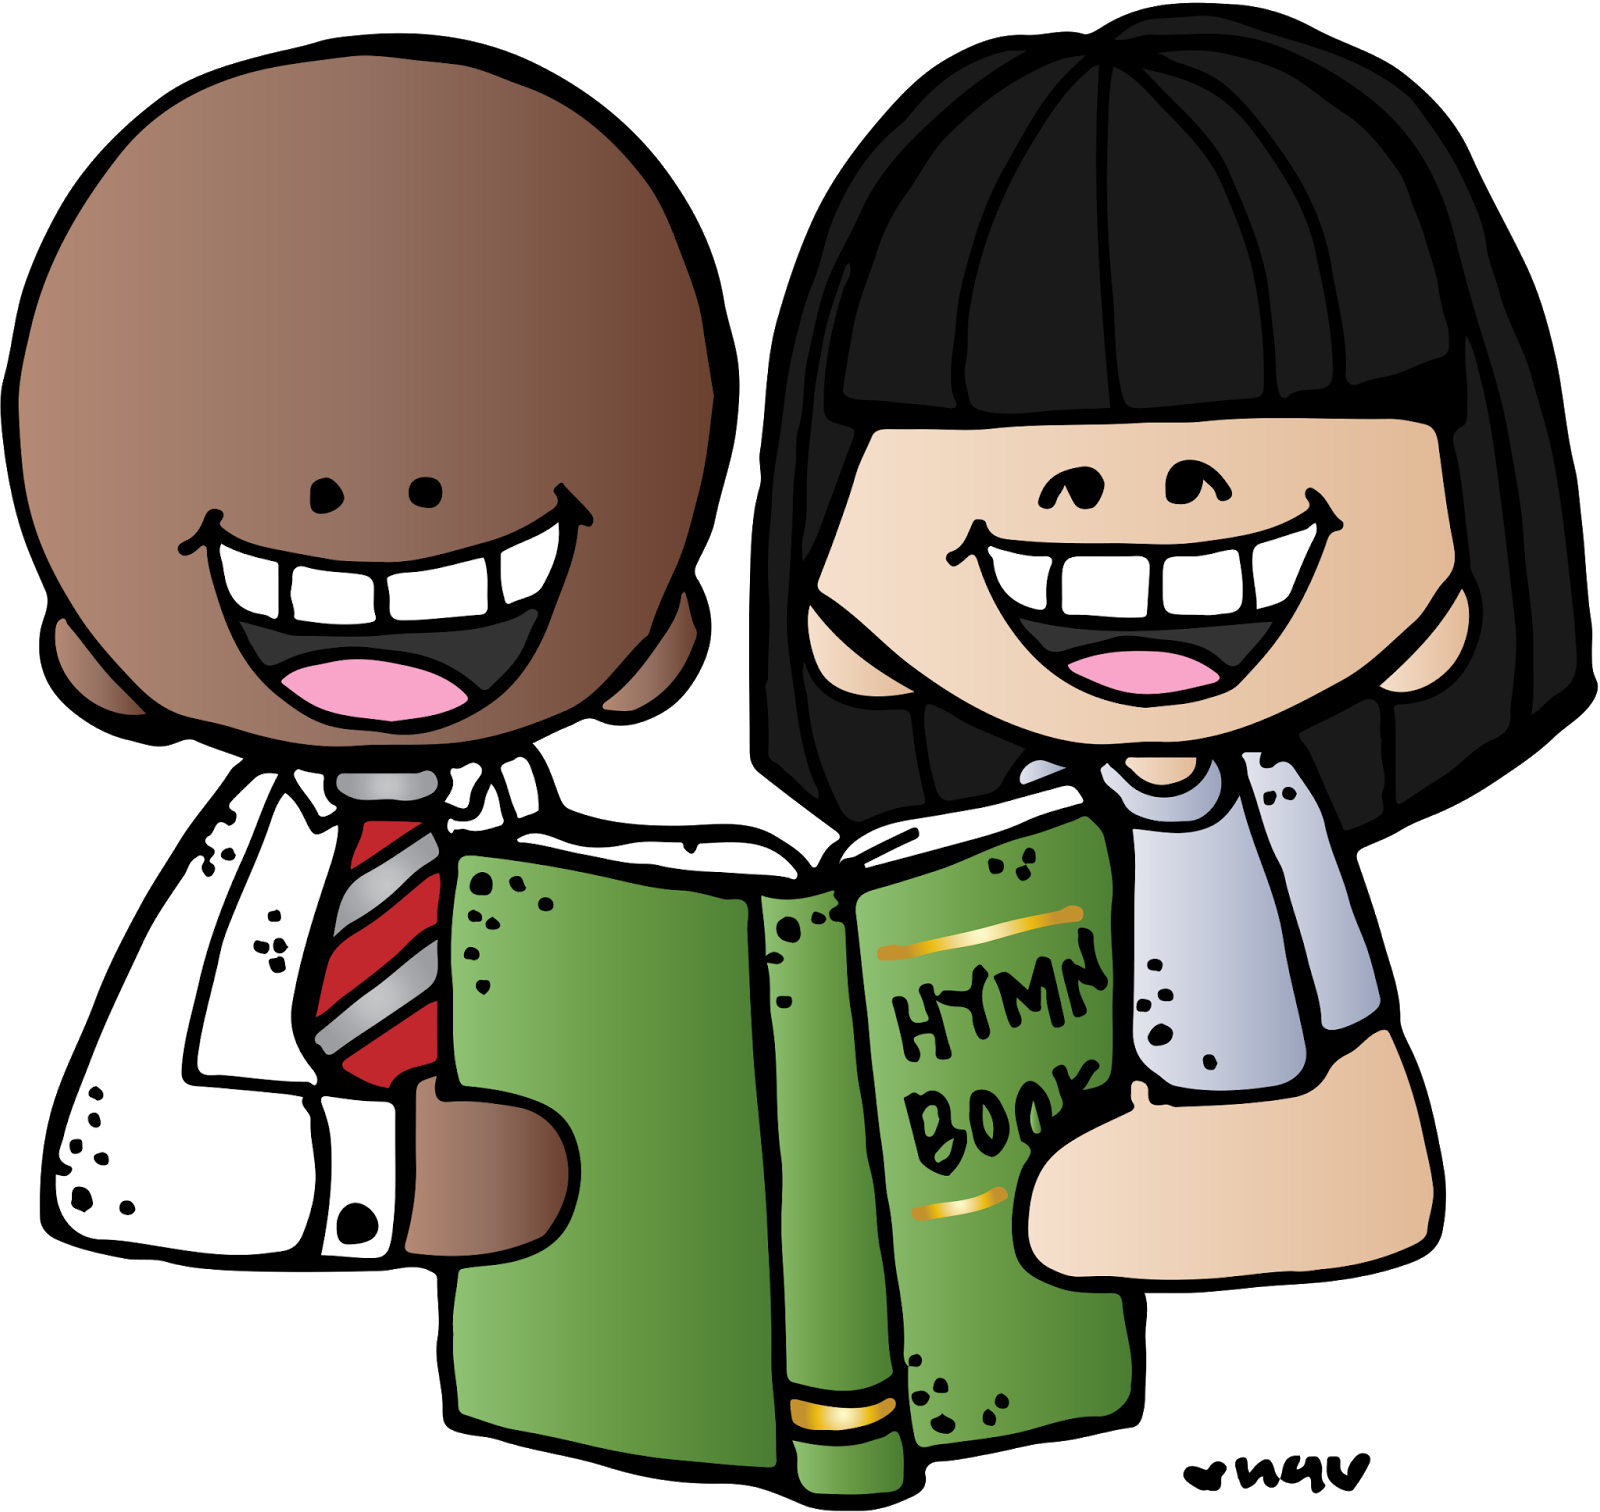 Hymn book kids mhldsf. Conference clipart kindergarten